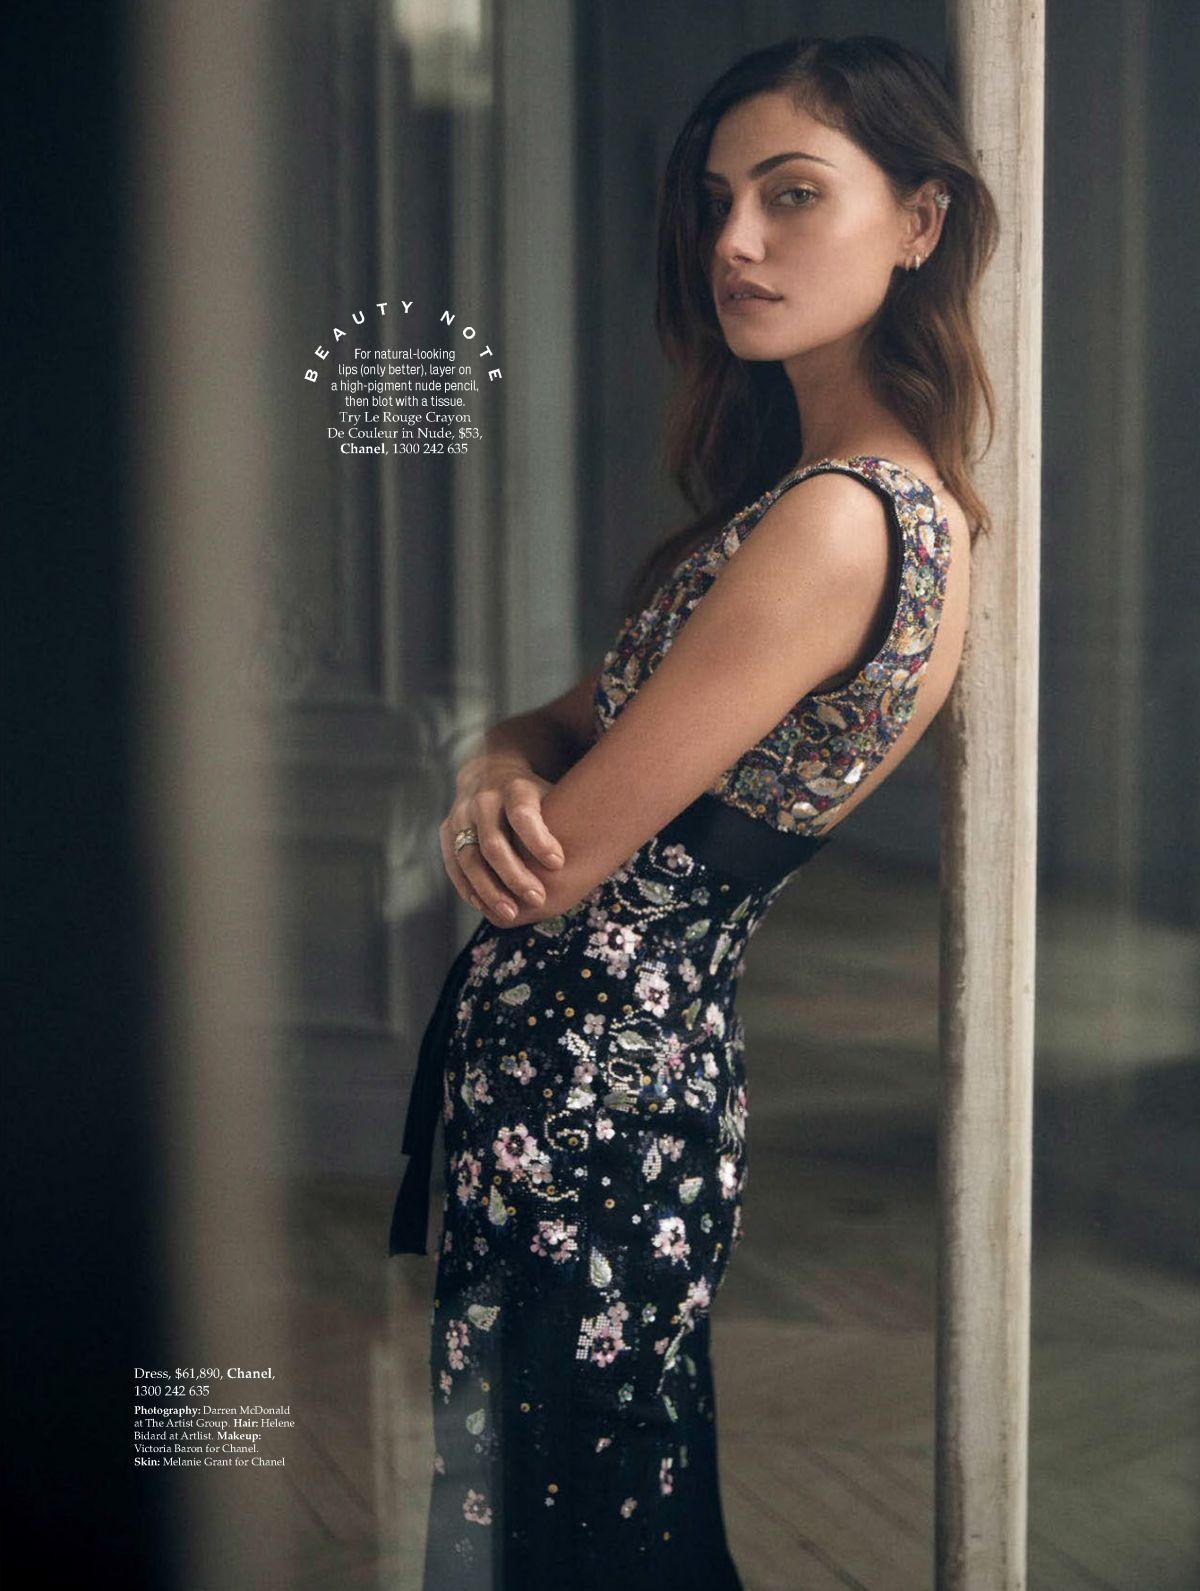 PHOEBE TONKIN in Elle Magazine, Australia July 2017 ...